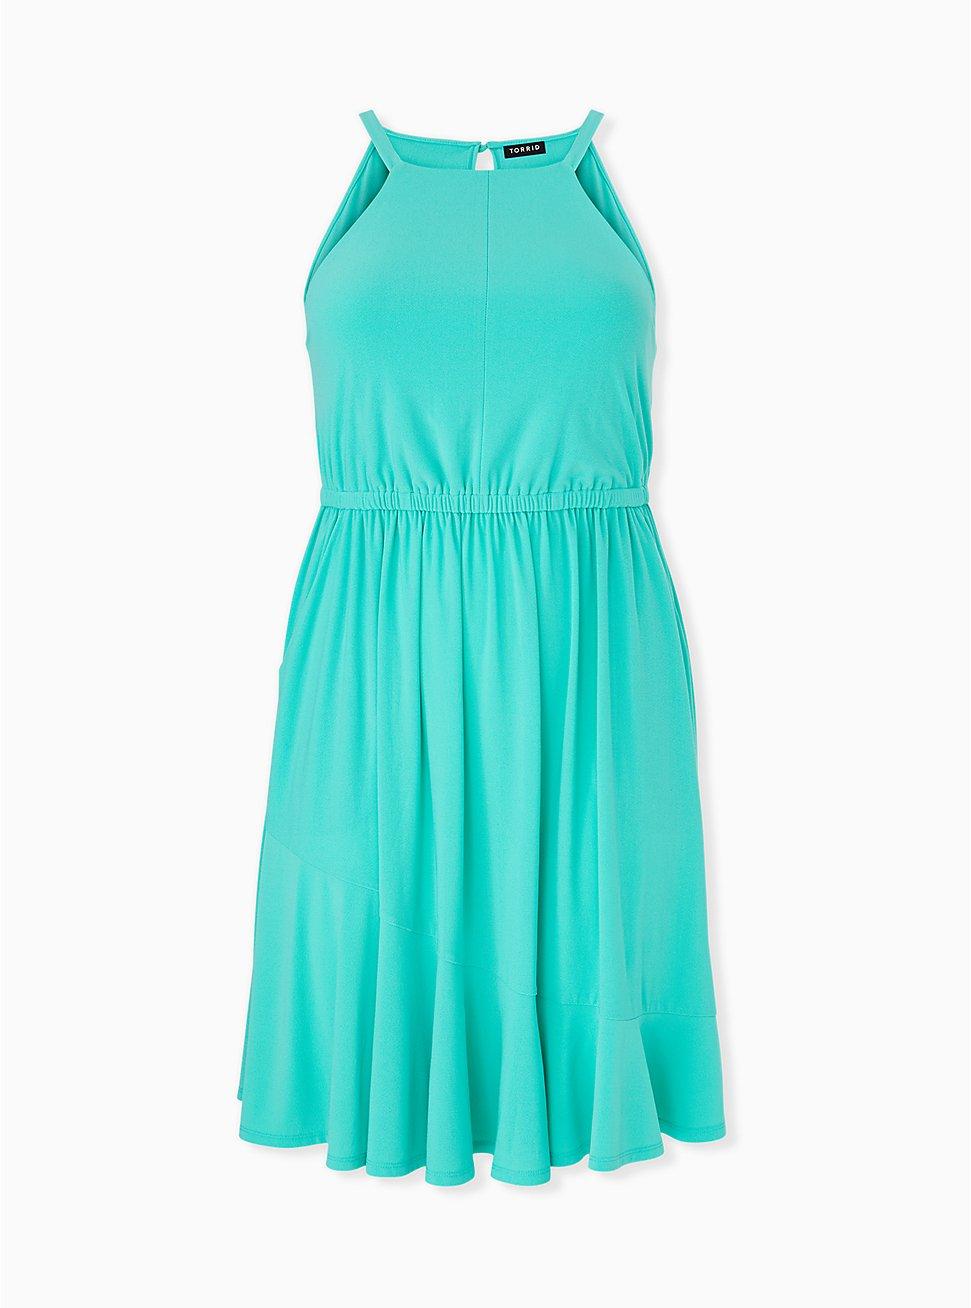 Turquoise Crepe High Neck Skater Dress, AQUA GREEN, hi-res